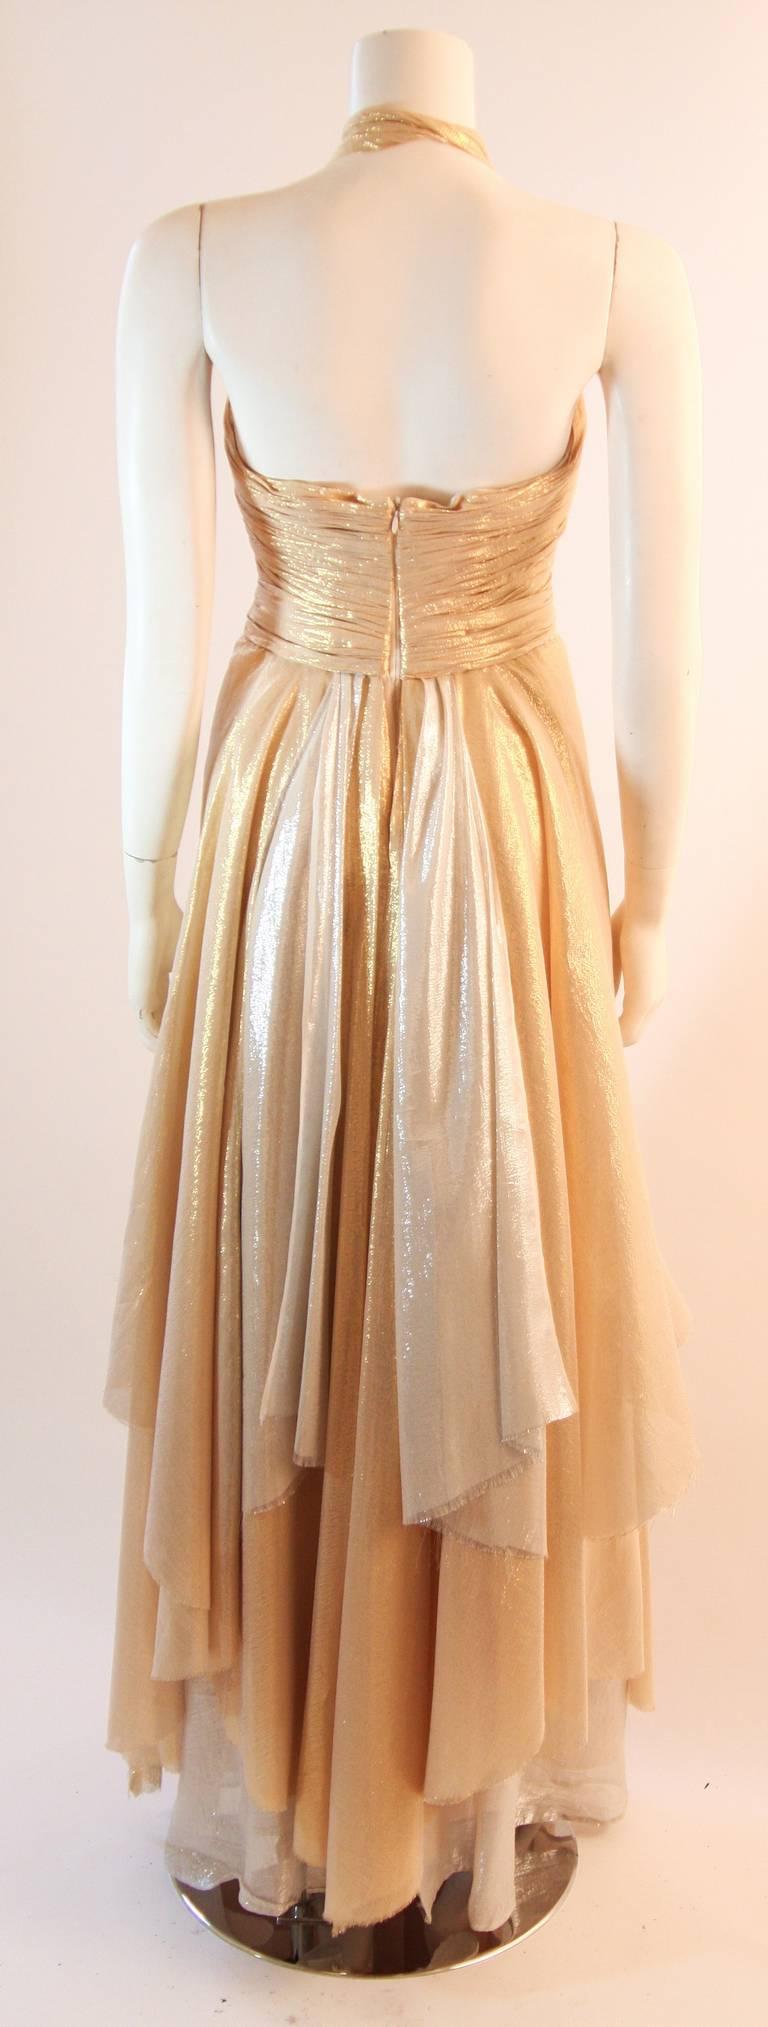 Elizabeth Mason Gold Lame Custom Couture Gown 7